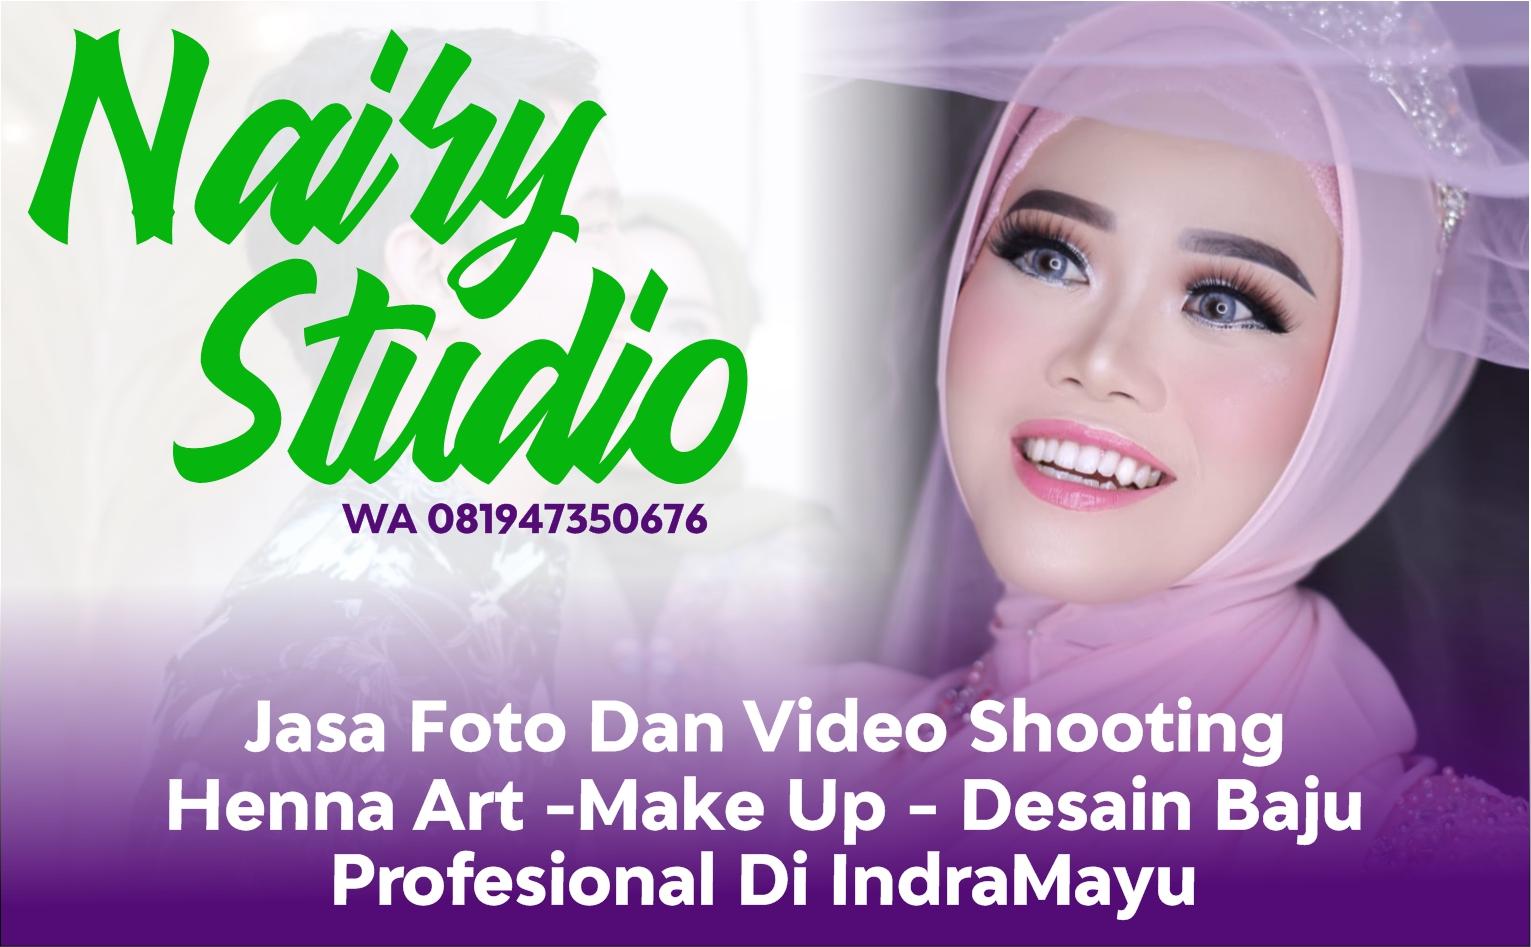 Info Nairy Studio - Jasa Foto Dan Video Shooting - Make Up Rias Pengantin - Henna Art - Desainer Baju Fashion Di Indramayu